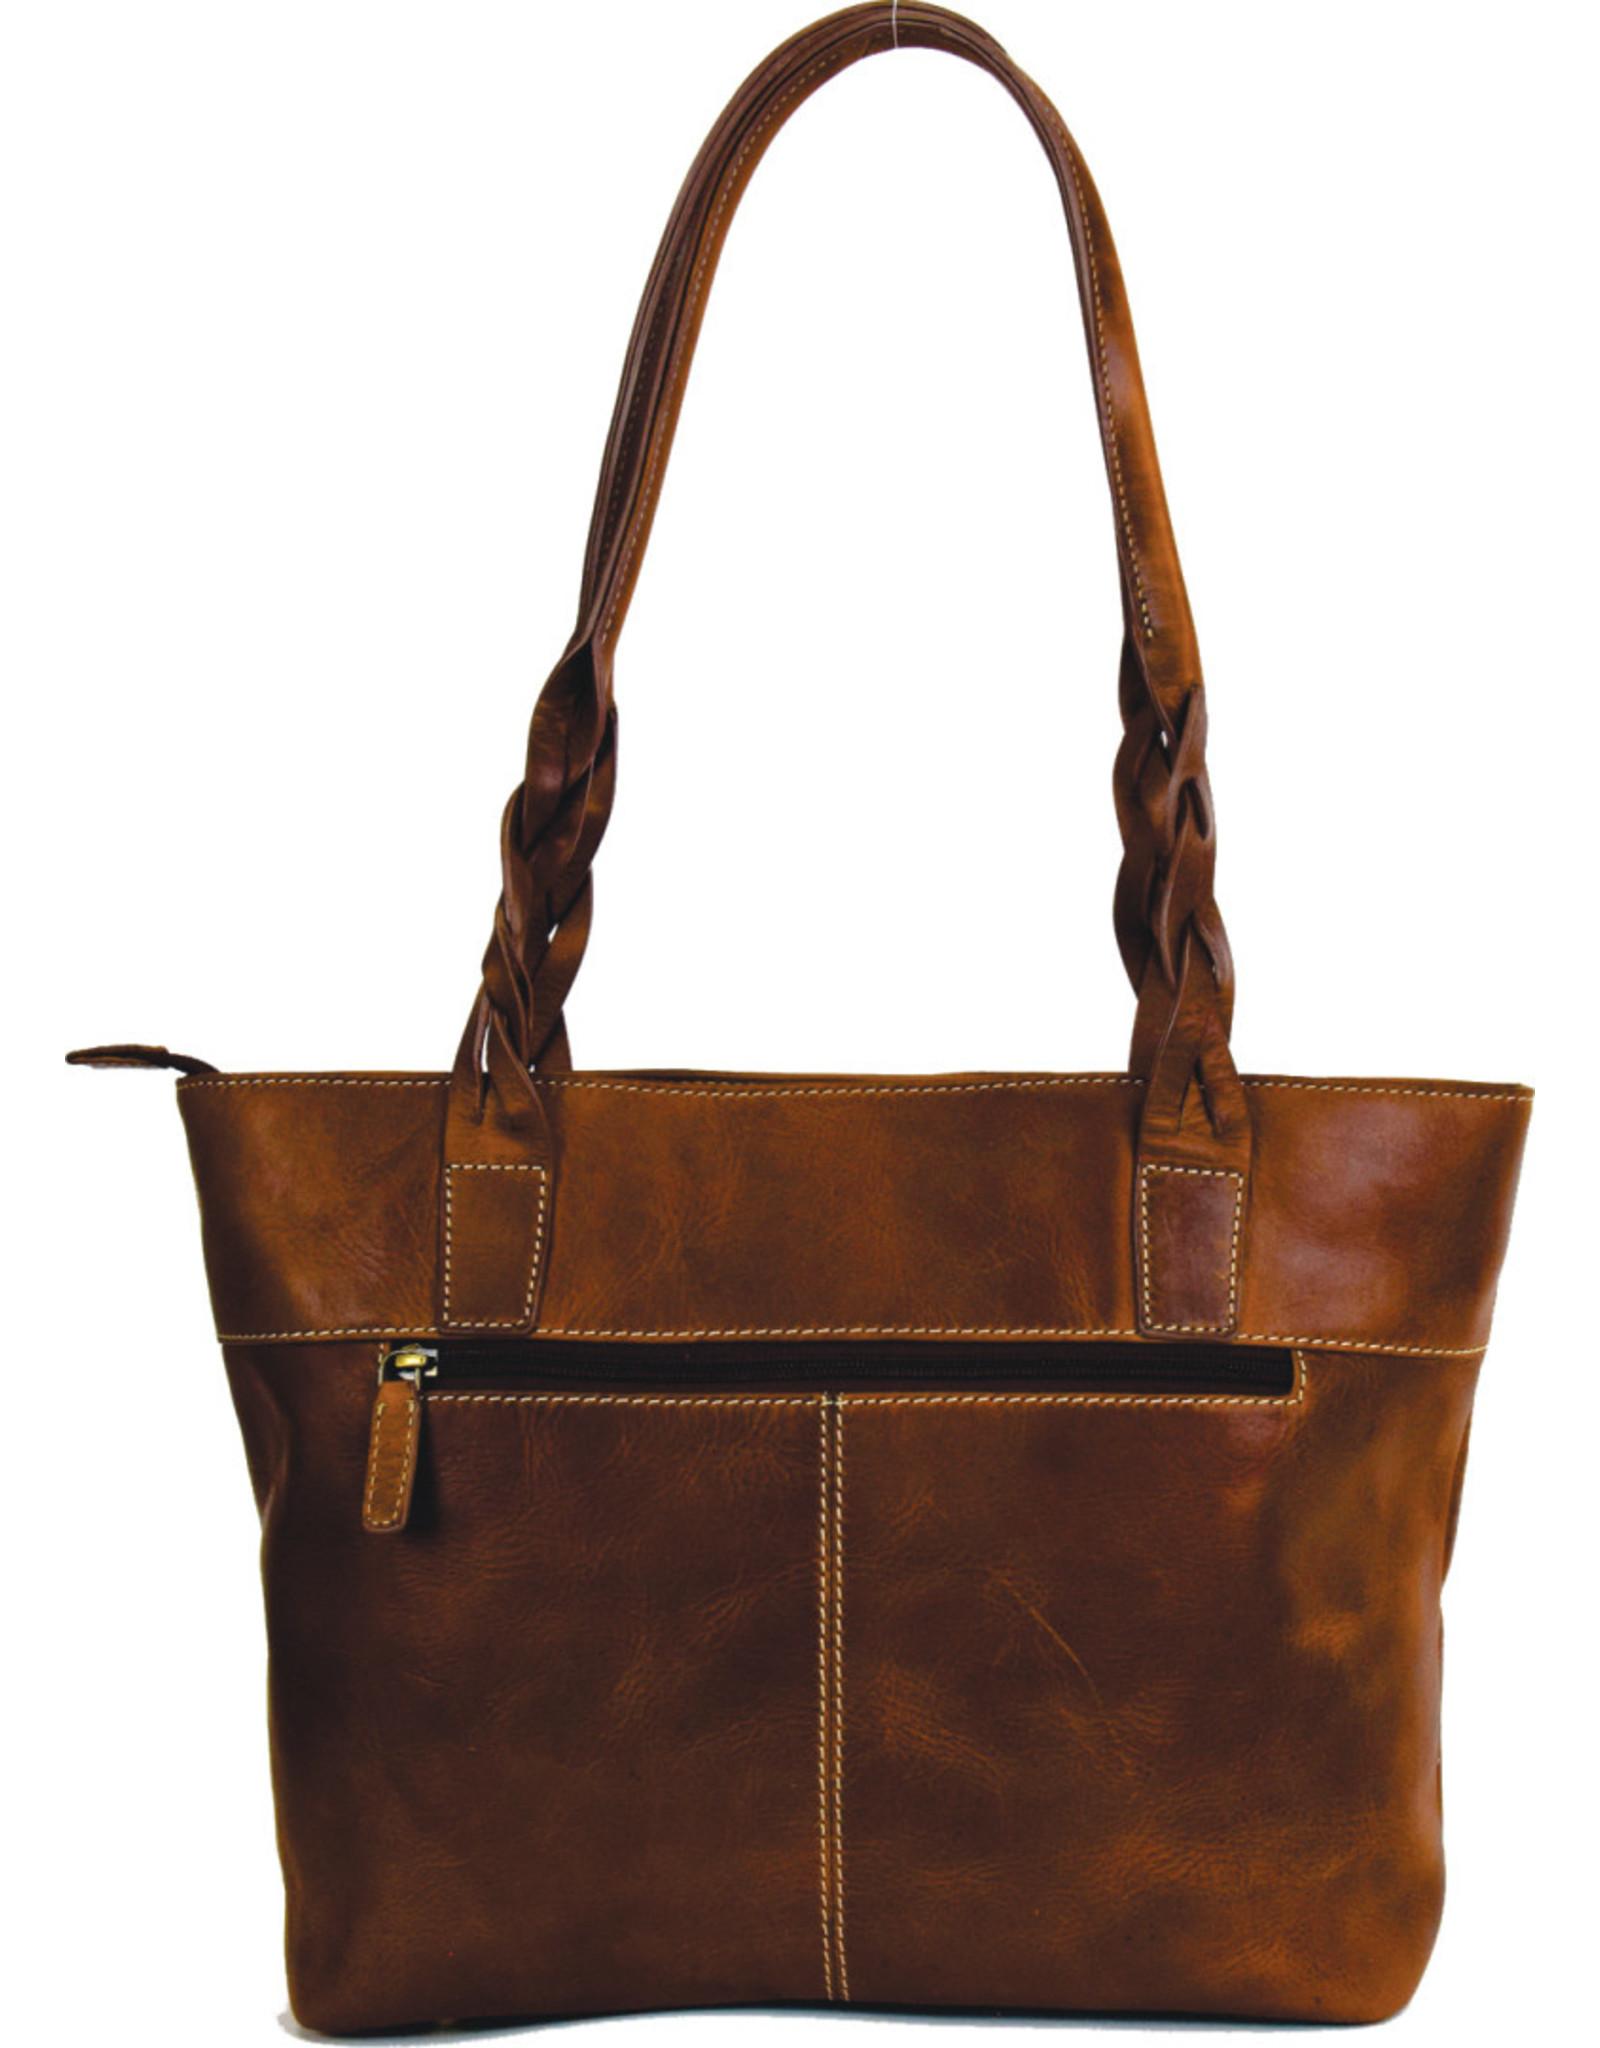 "Rugged Earth Rugged Earth Handbag with Top Zipper 199025 Brown W 14 3/4""*H 9 1/2""*D 4"""